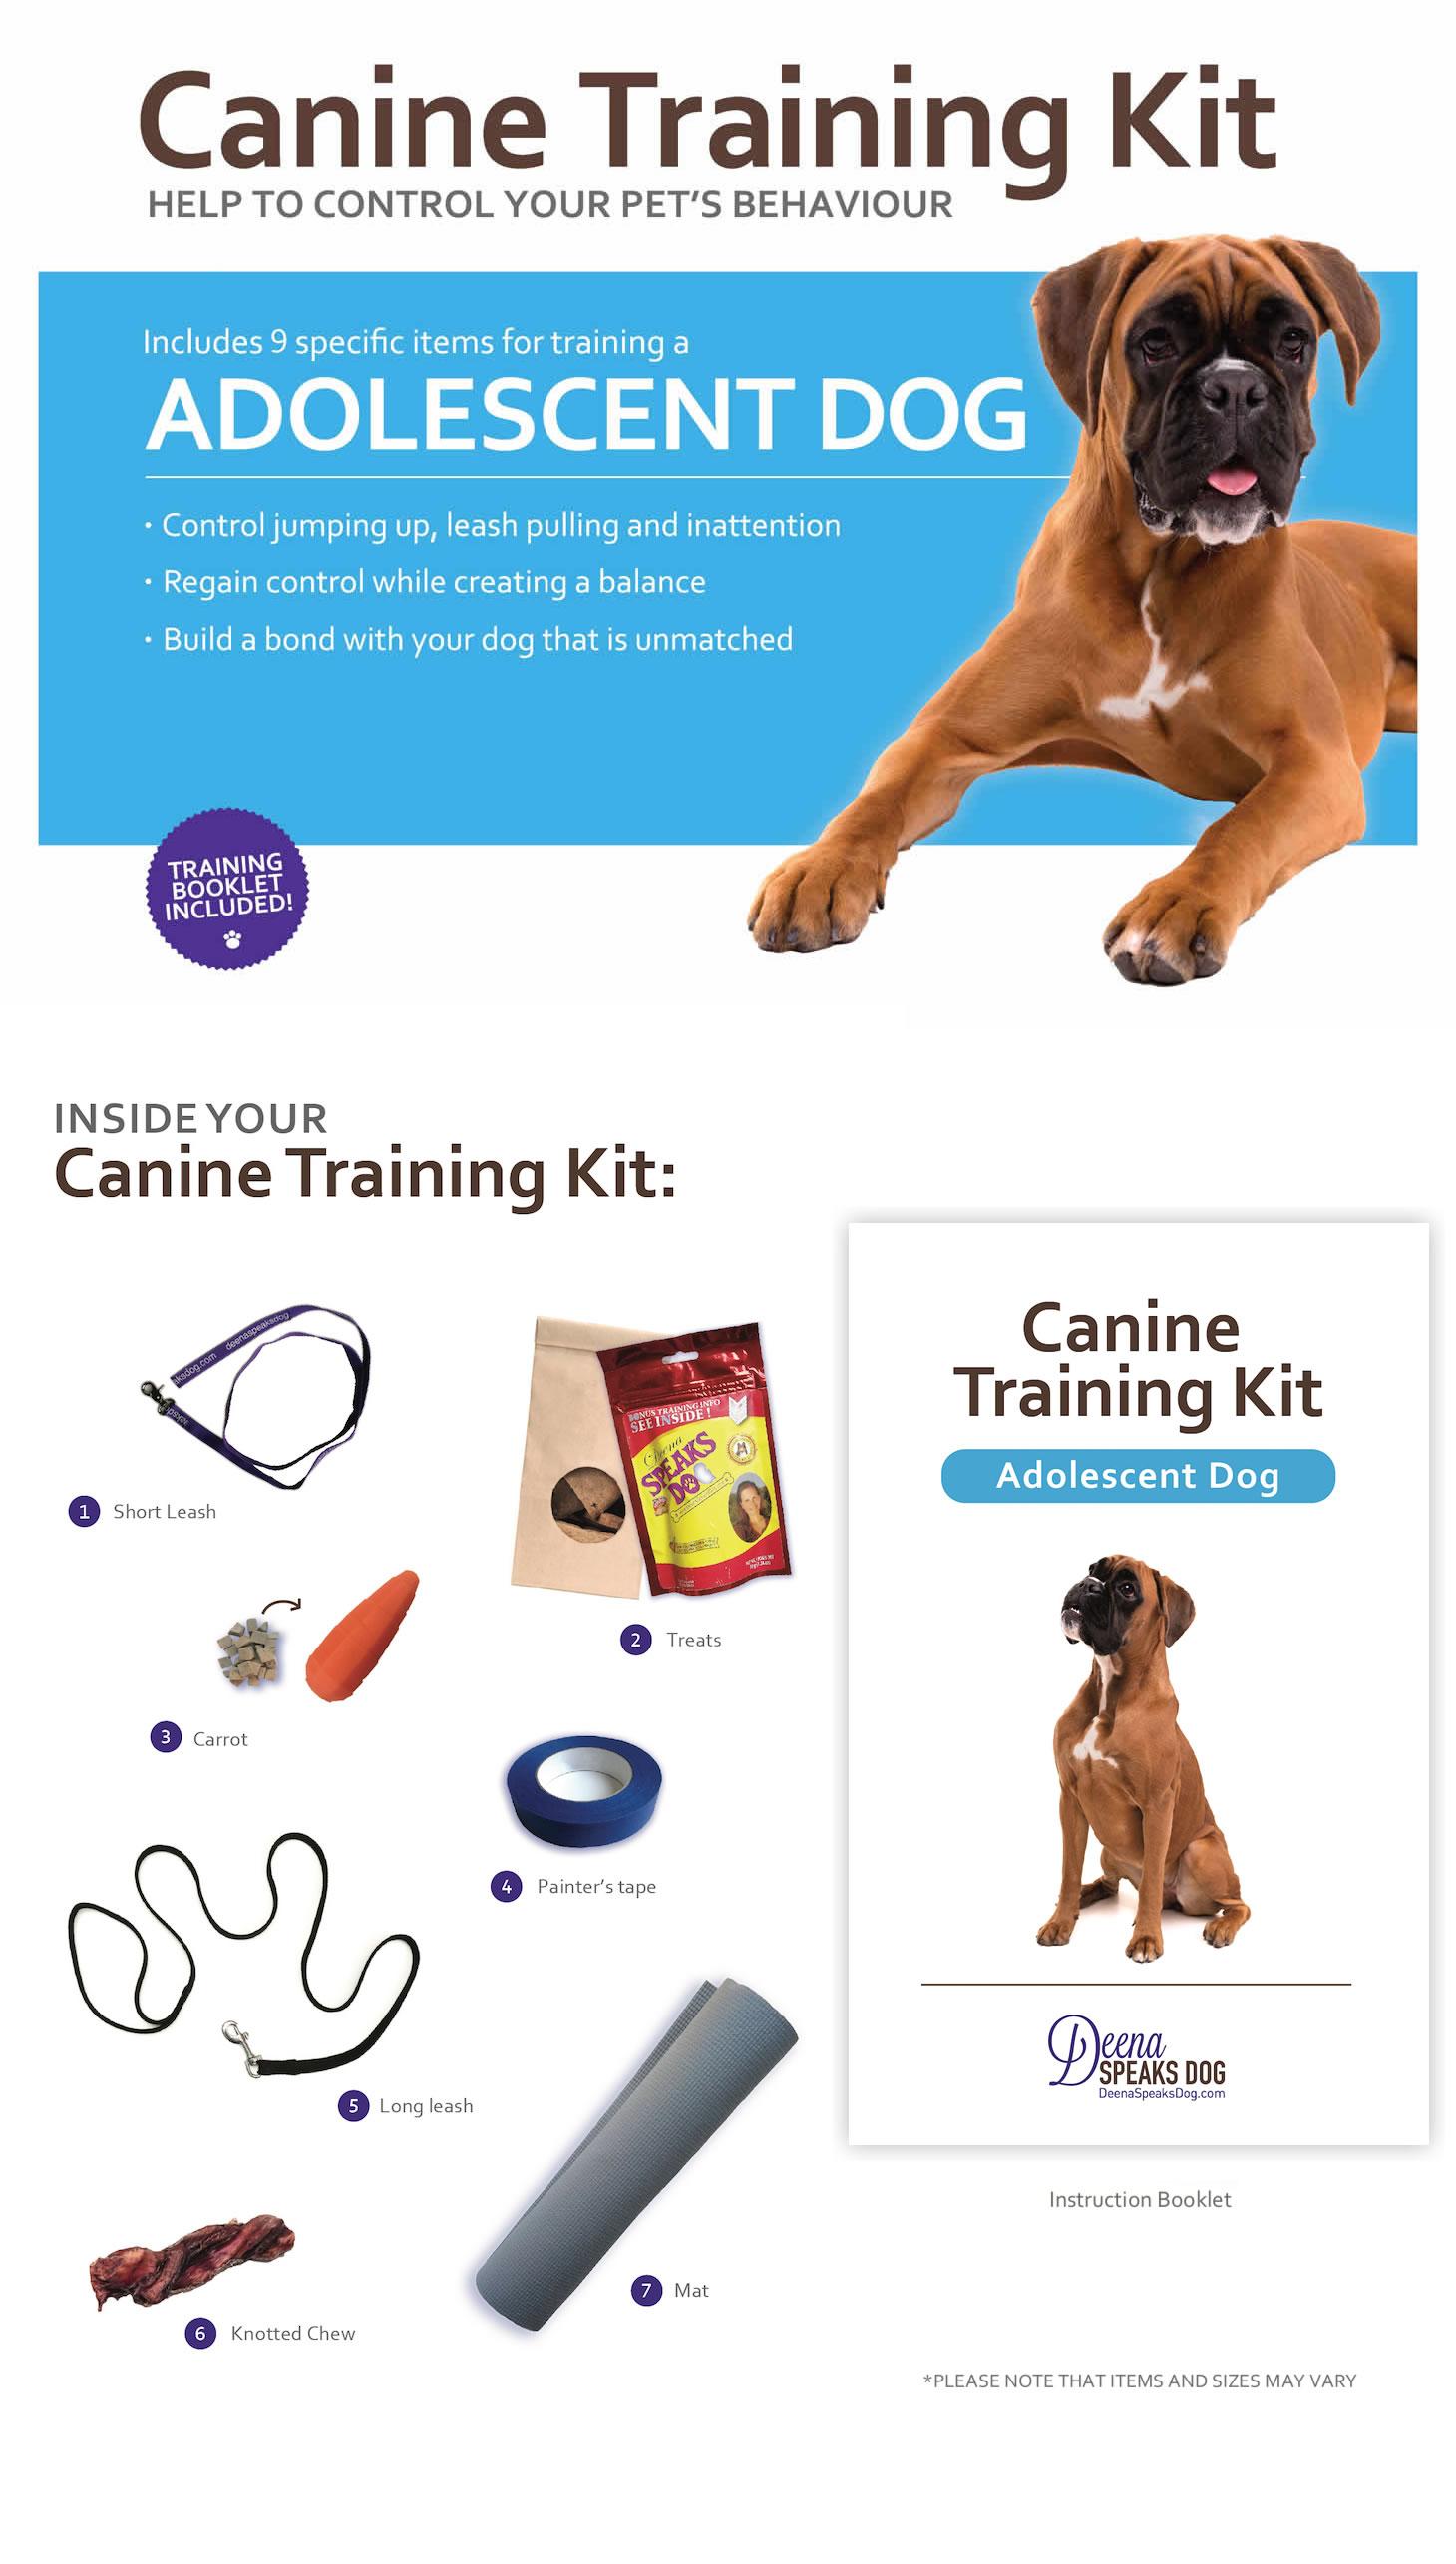 Adolescent Dog Training Kit